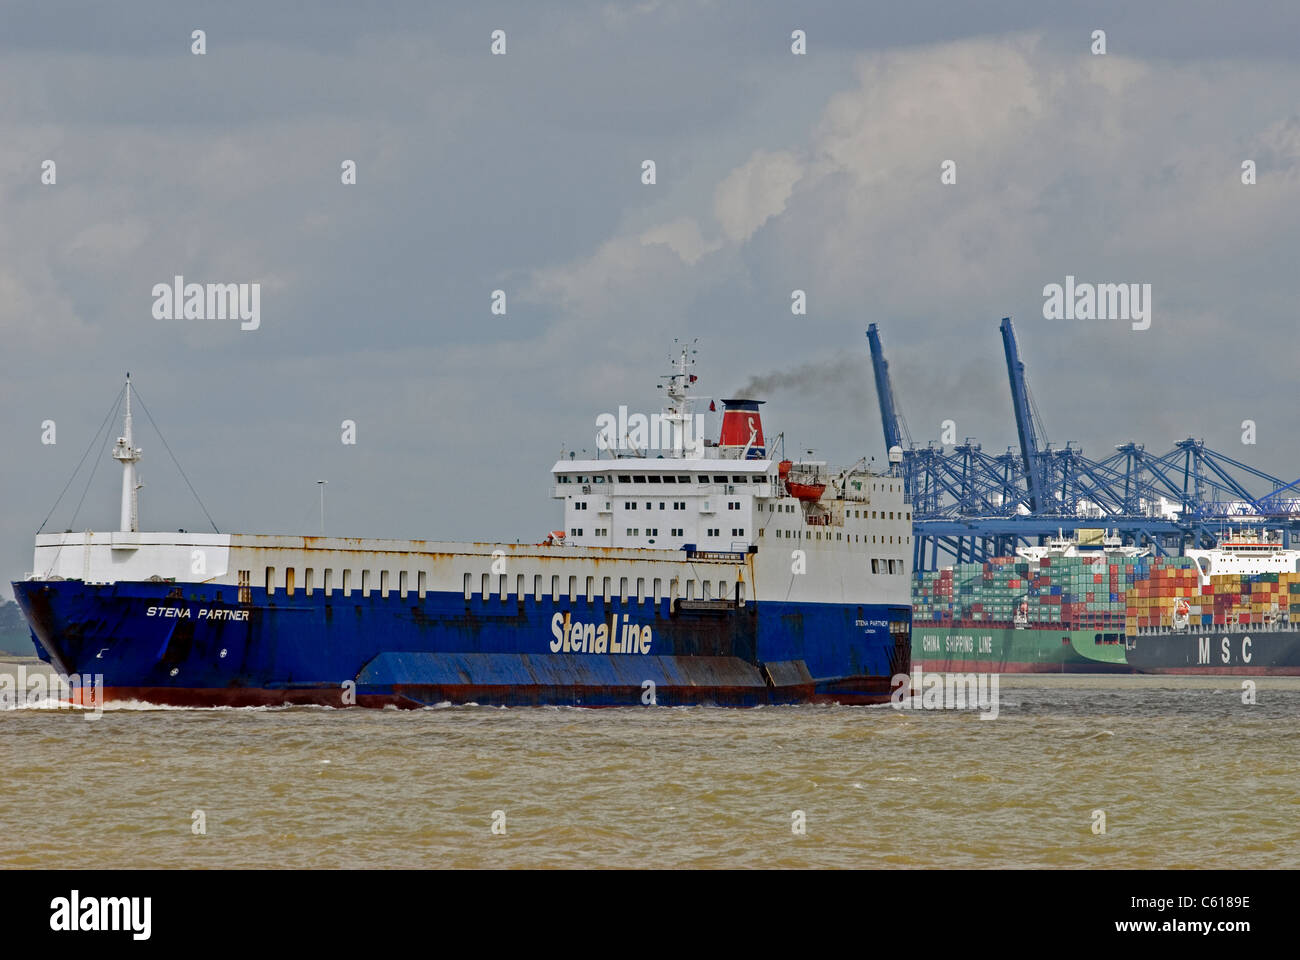 Stena Line Ro-Ro ferry leaving the port of Felixstowe, Suffolk, UK. - Stock Image